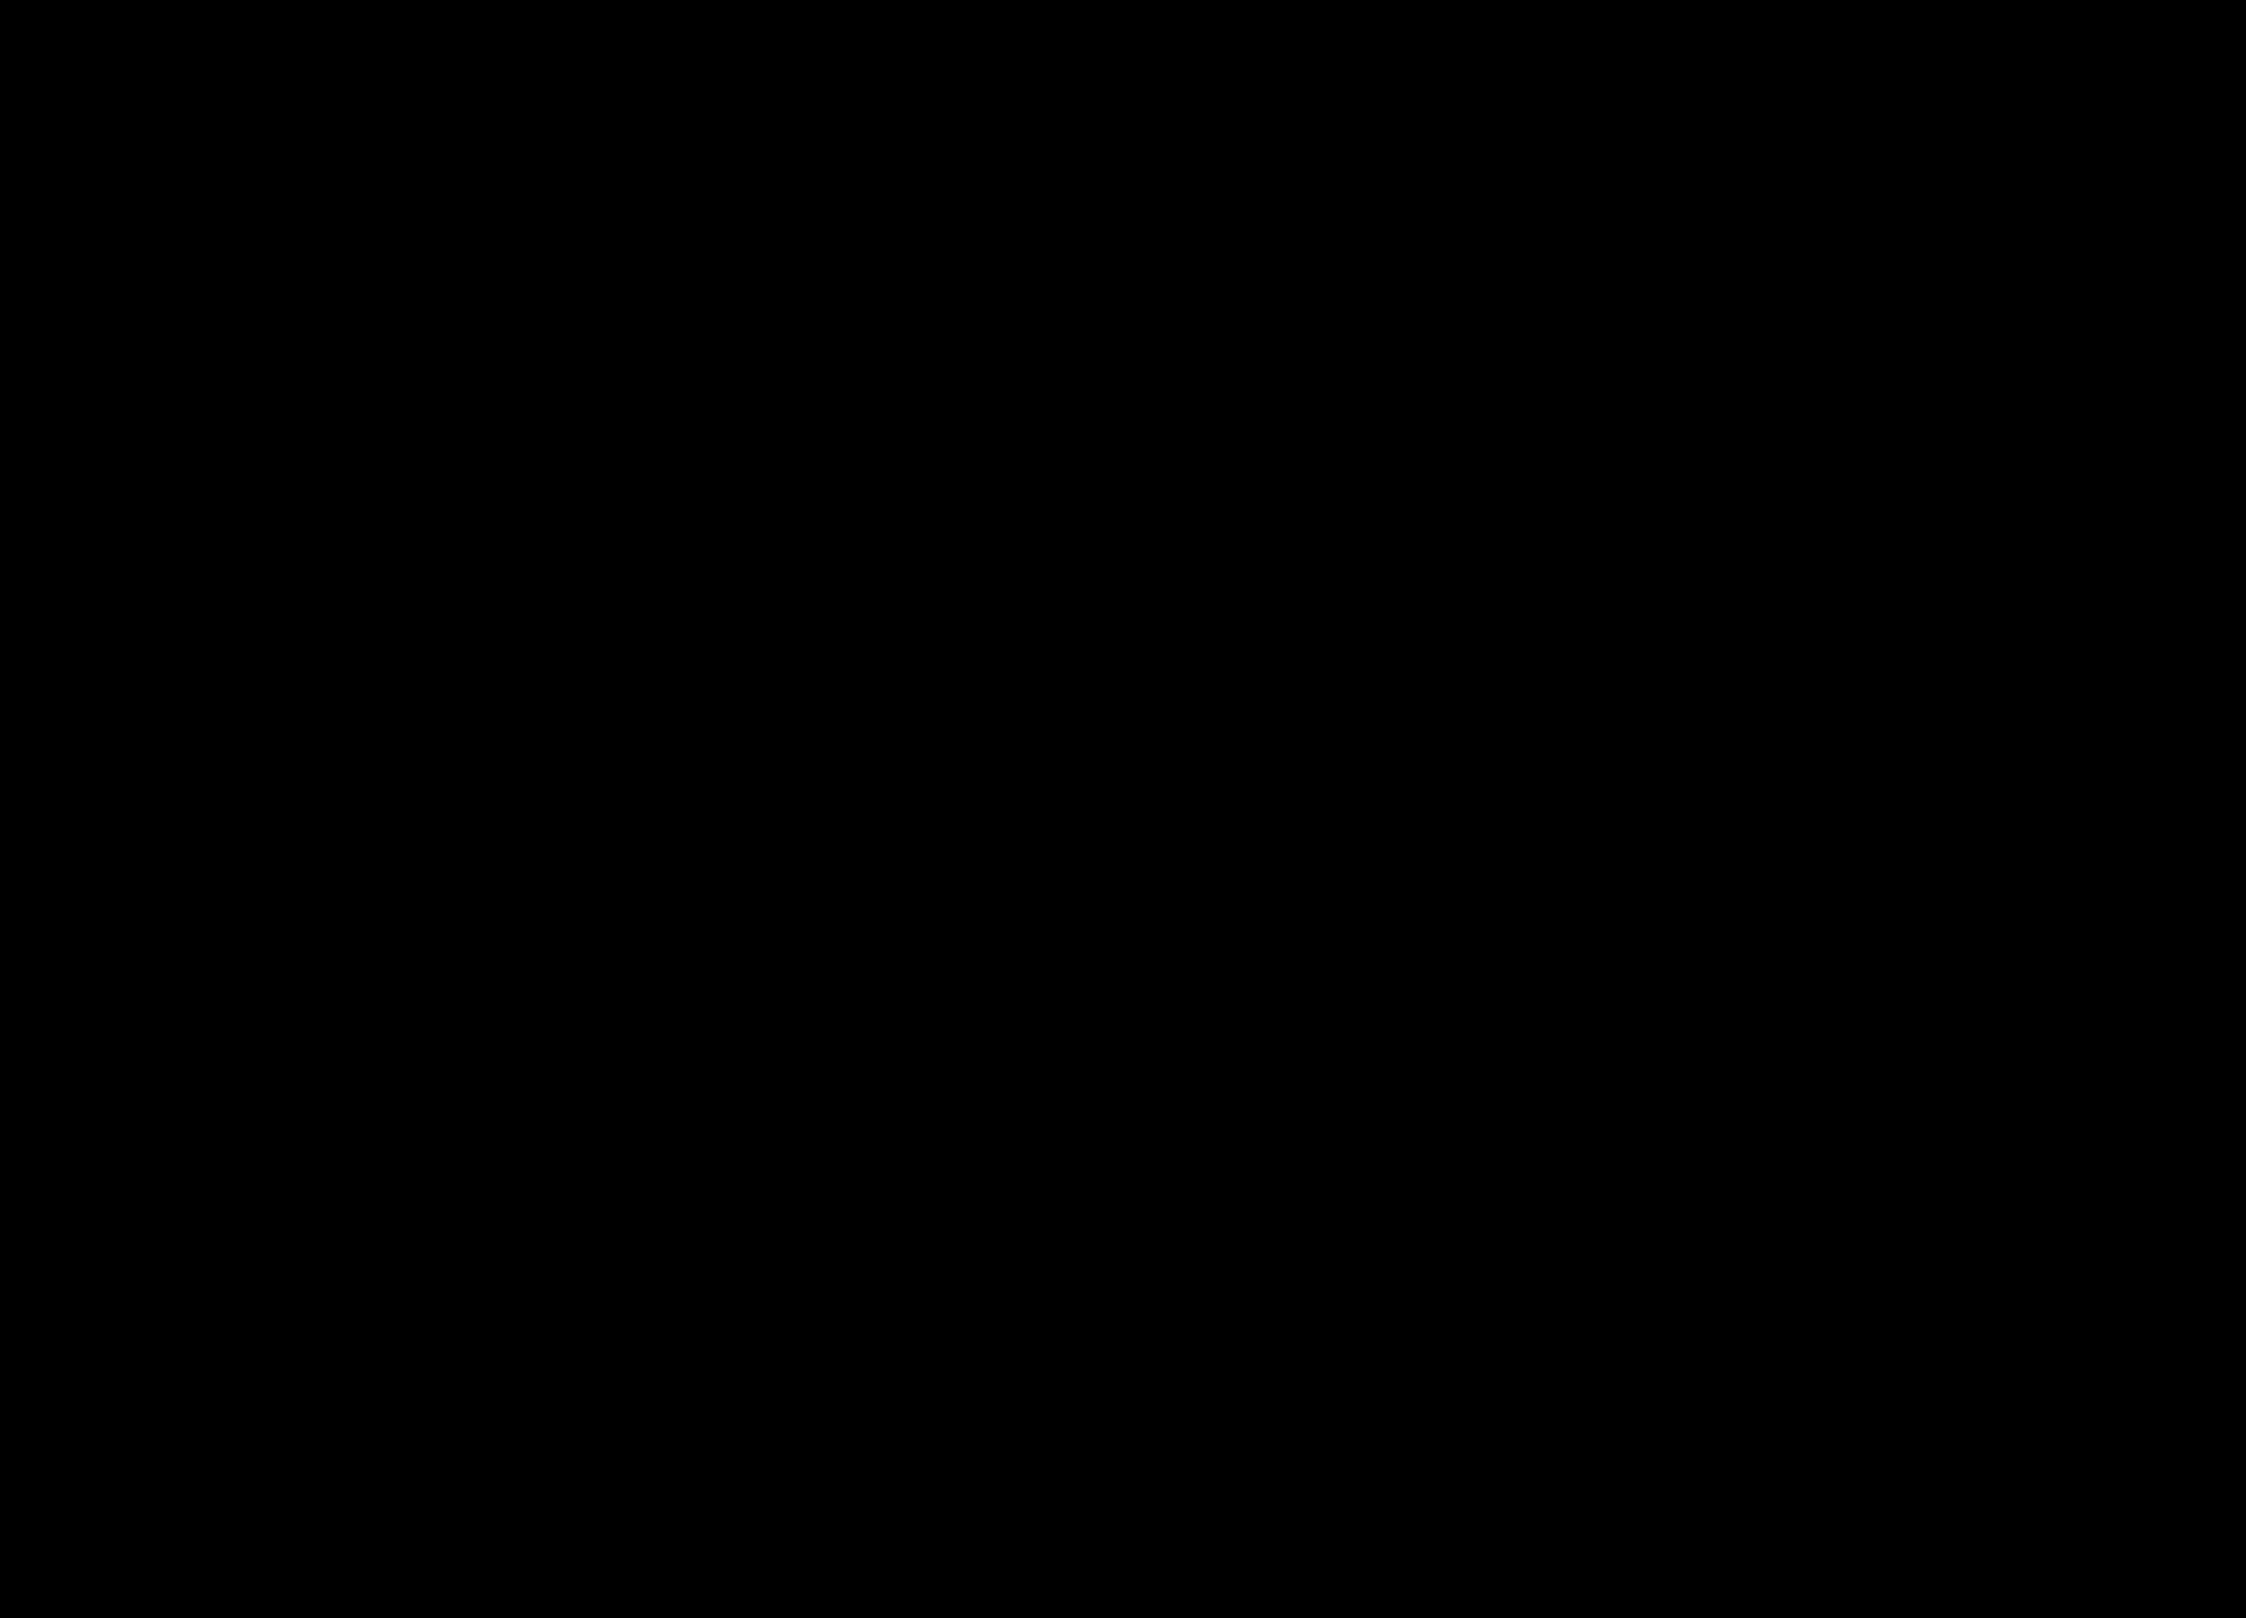 Halloween pumpkin clipart evil clip art black and white Clipart - Evil Jack O Lantern Silhouette clip art black and white